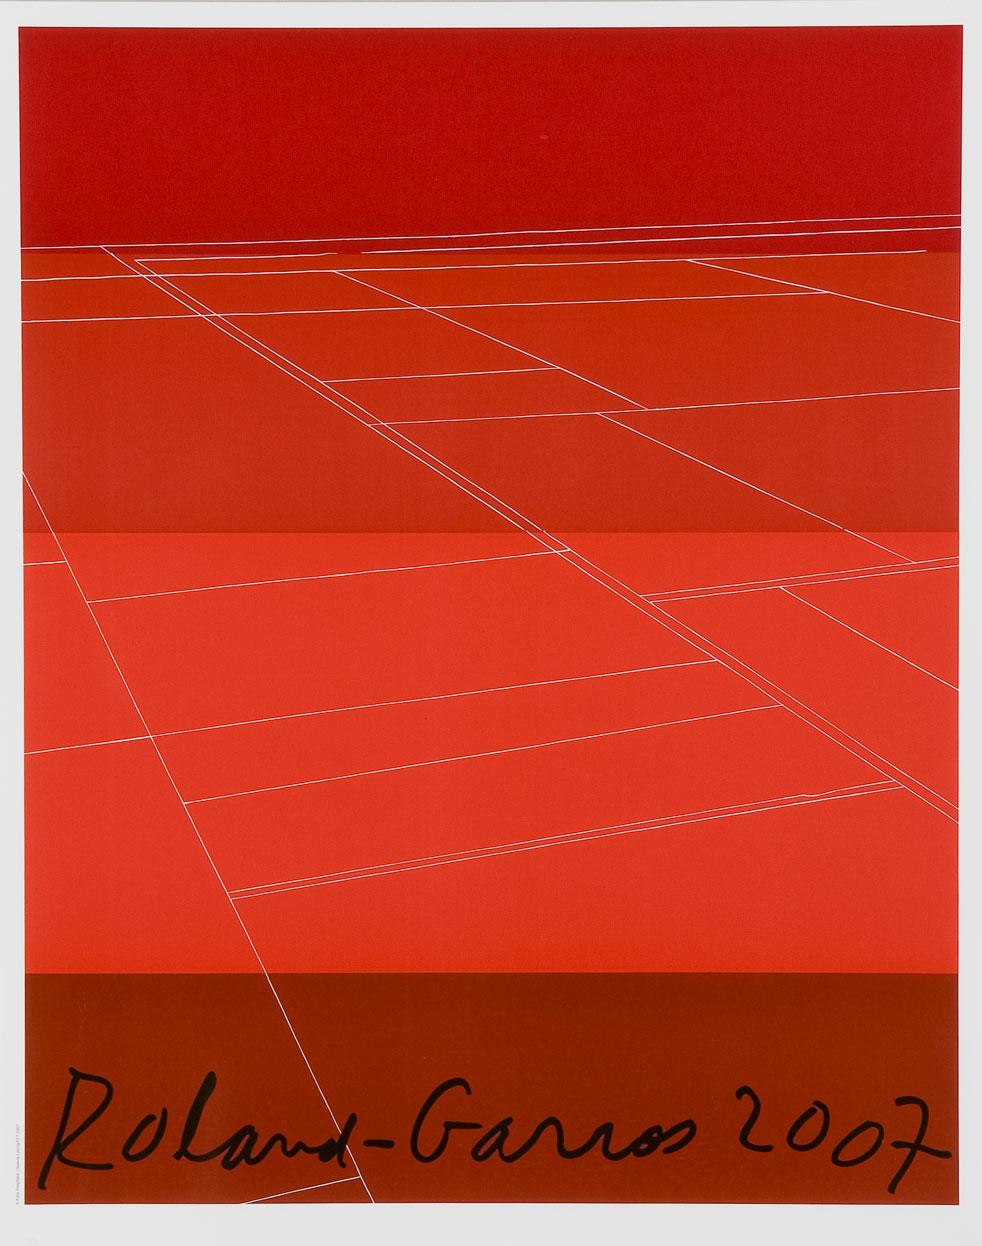 ROLAND-GARROS-2007_web.jpg